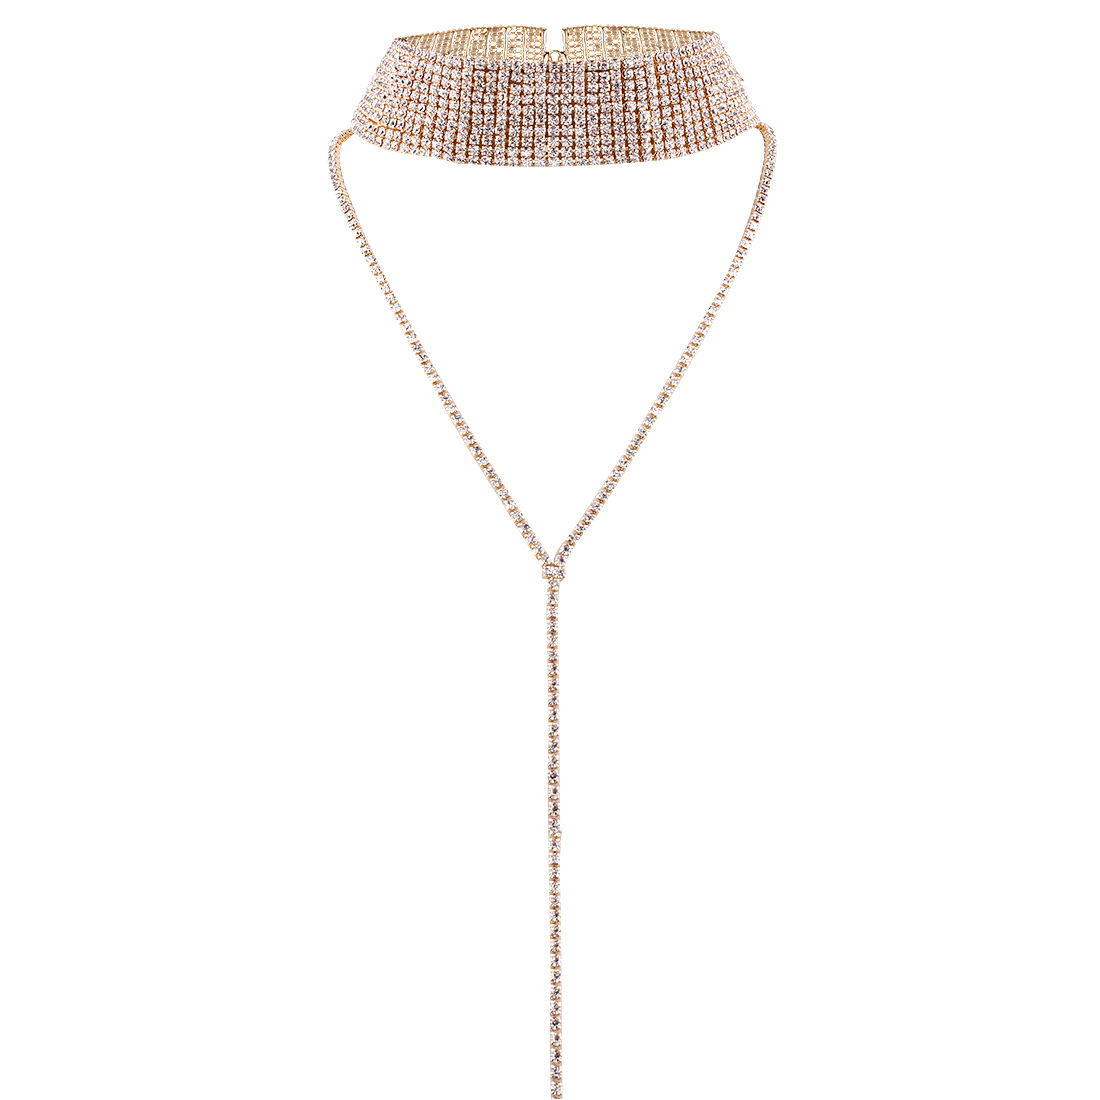 Personalized jewelry popular neck chain choker multi-layer full diamond necklace NHMD177682